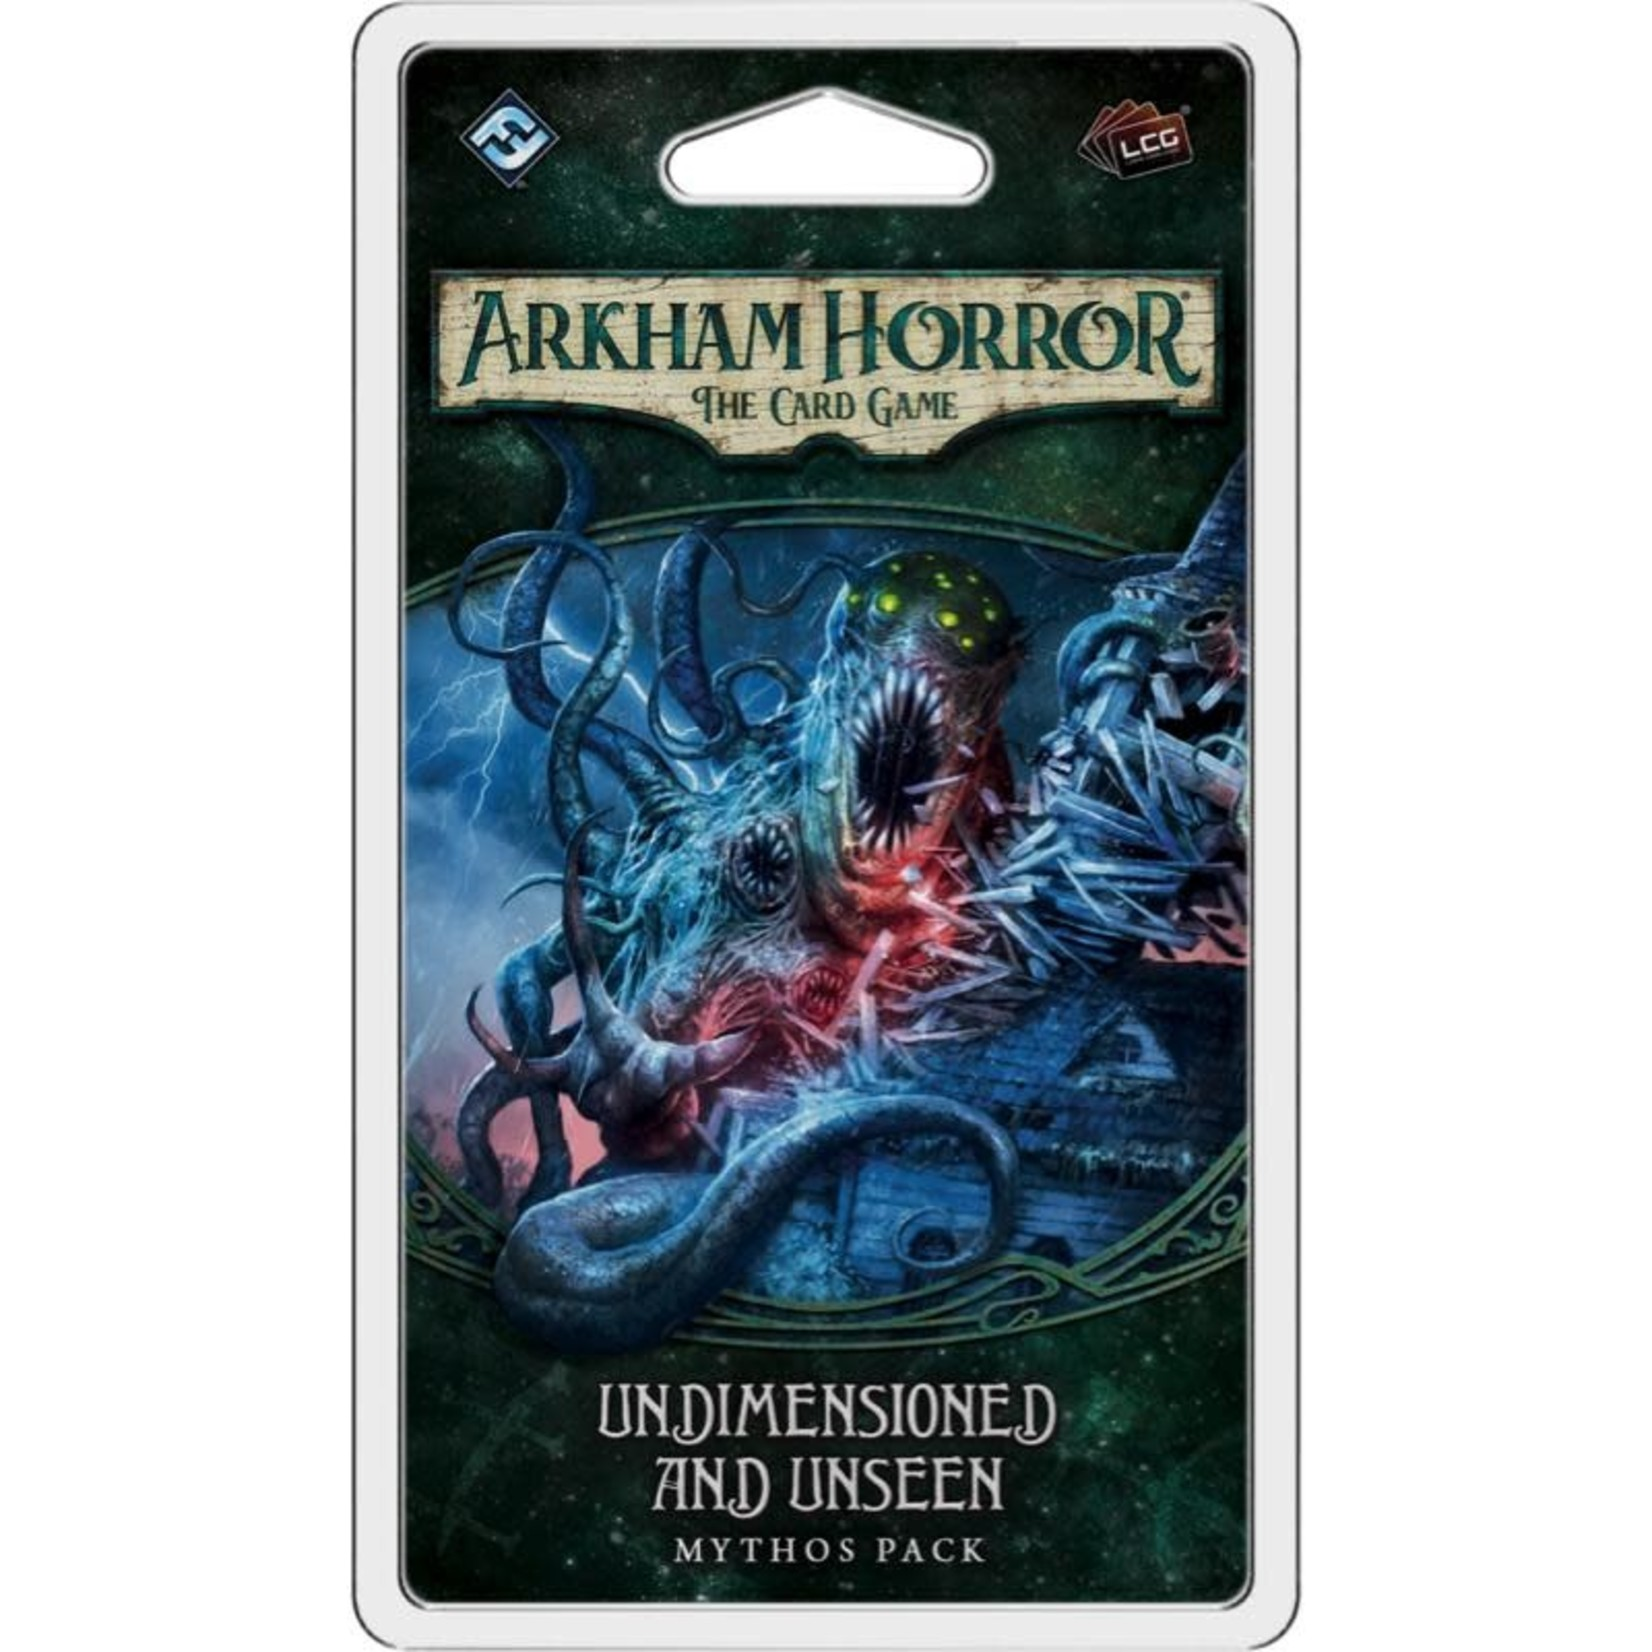 Arkham Horror LCG: Undimensioned & Unseen Mythos Pack